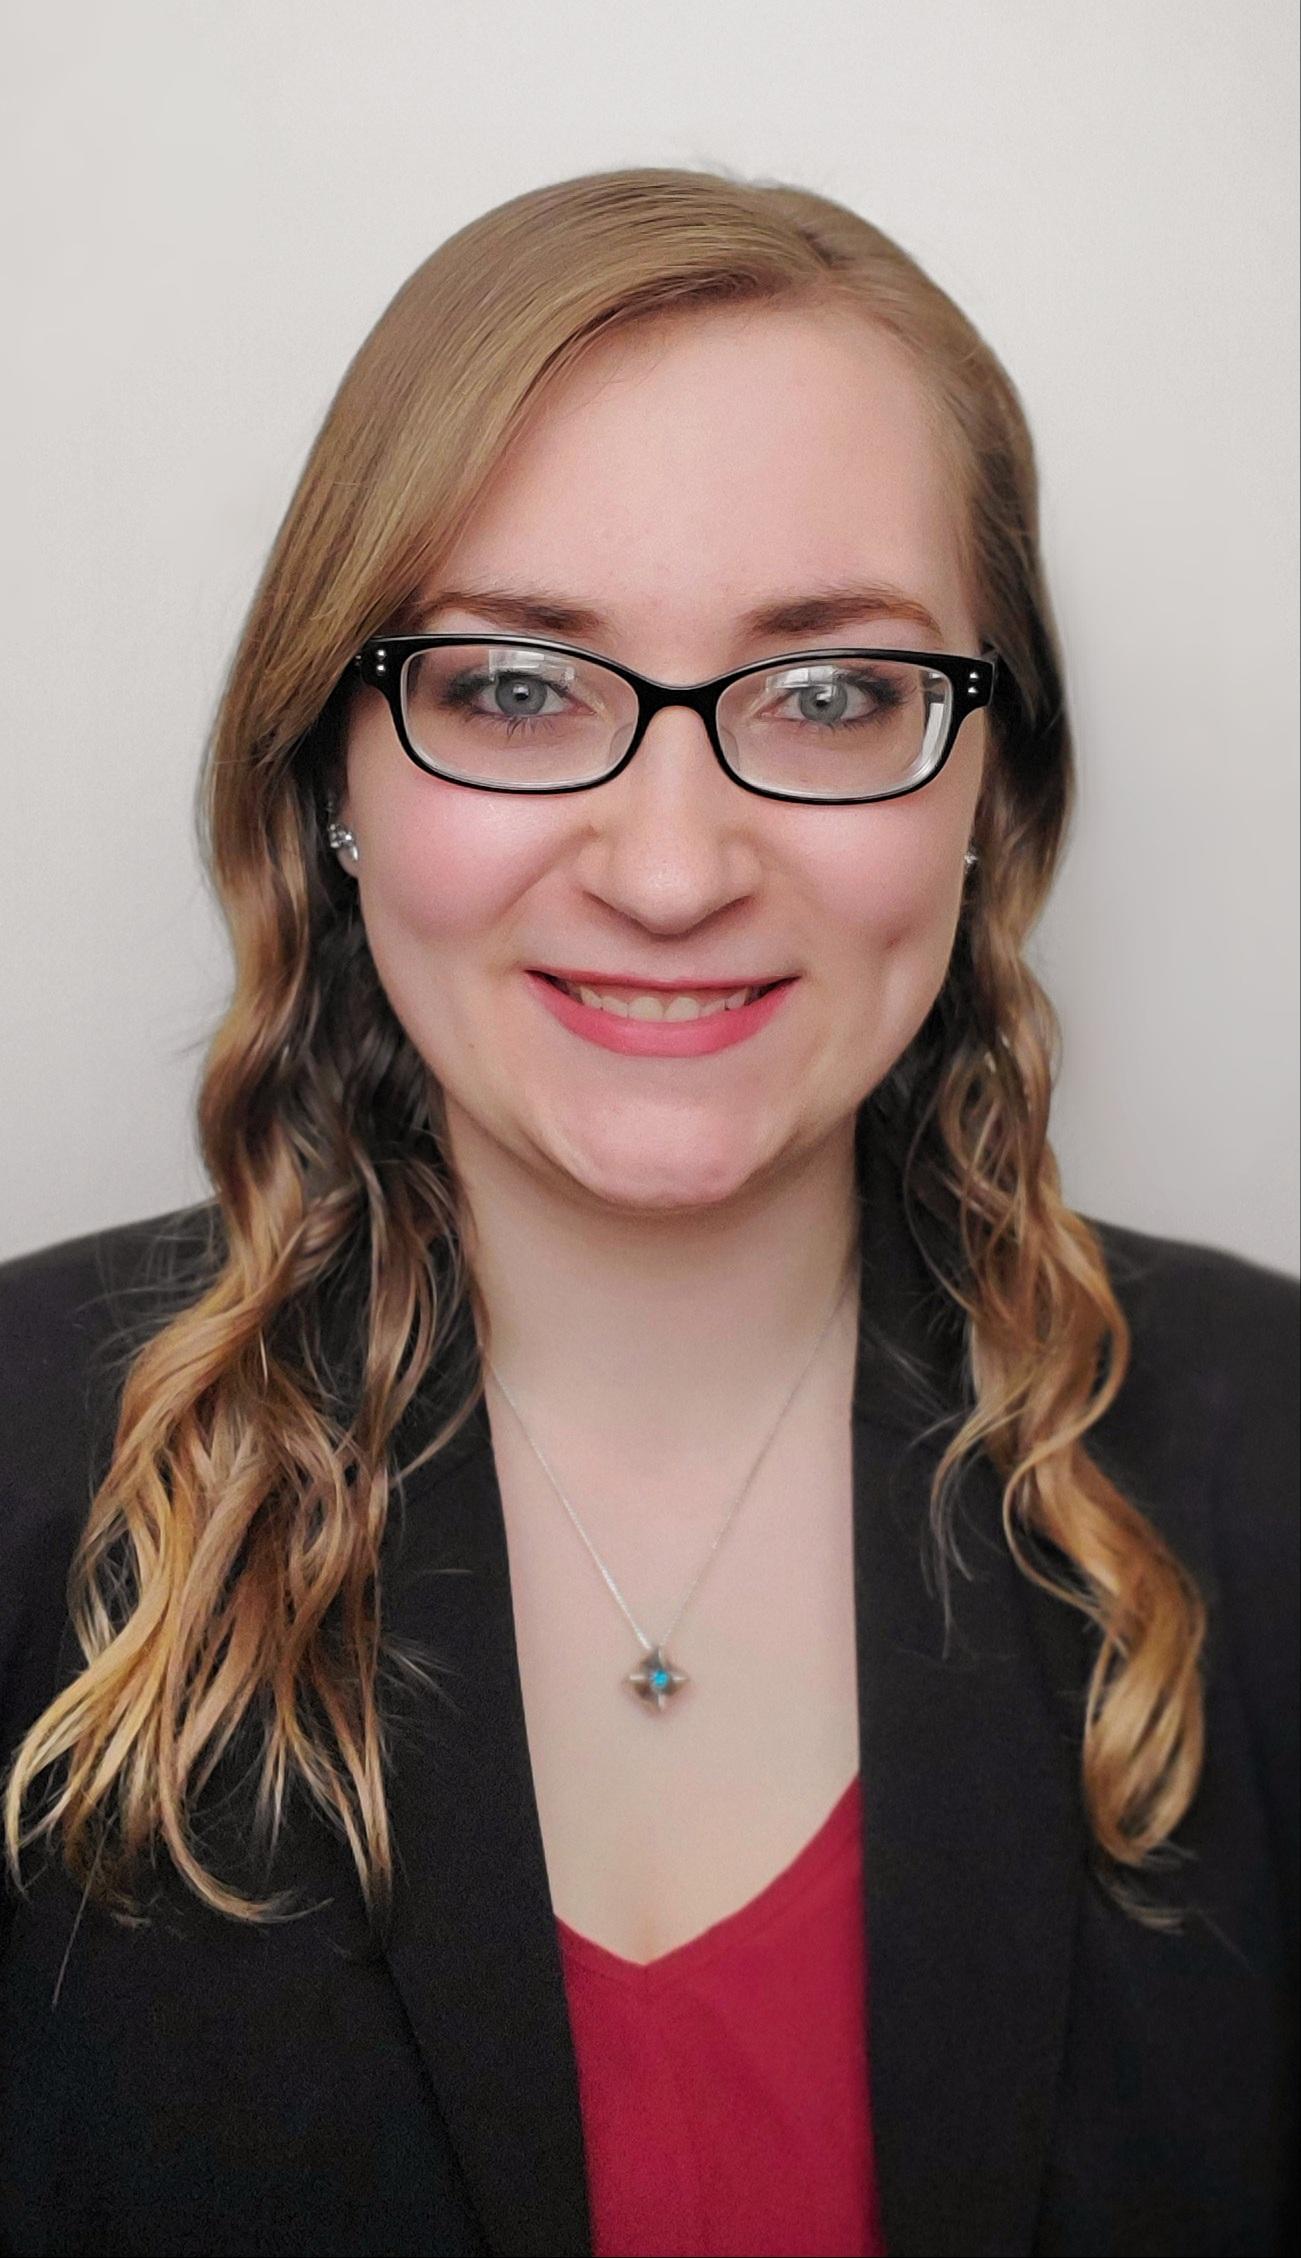 Melissa Benzshawel